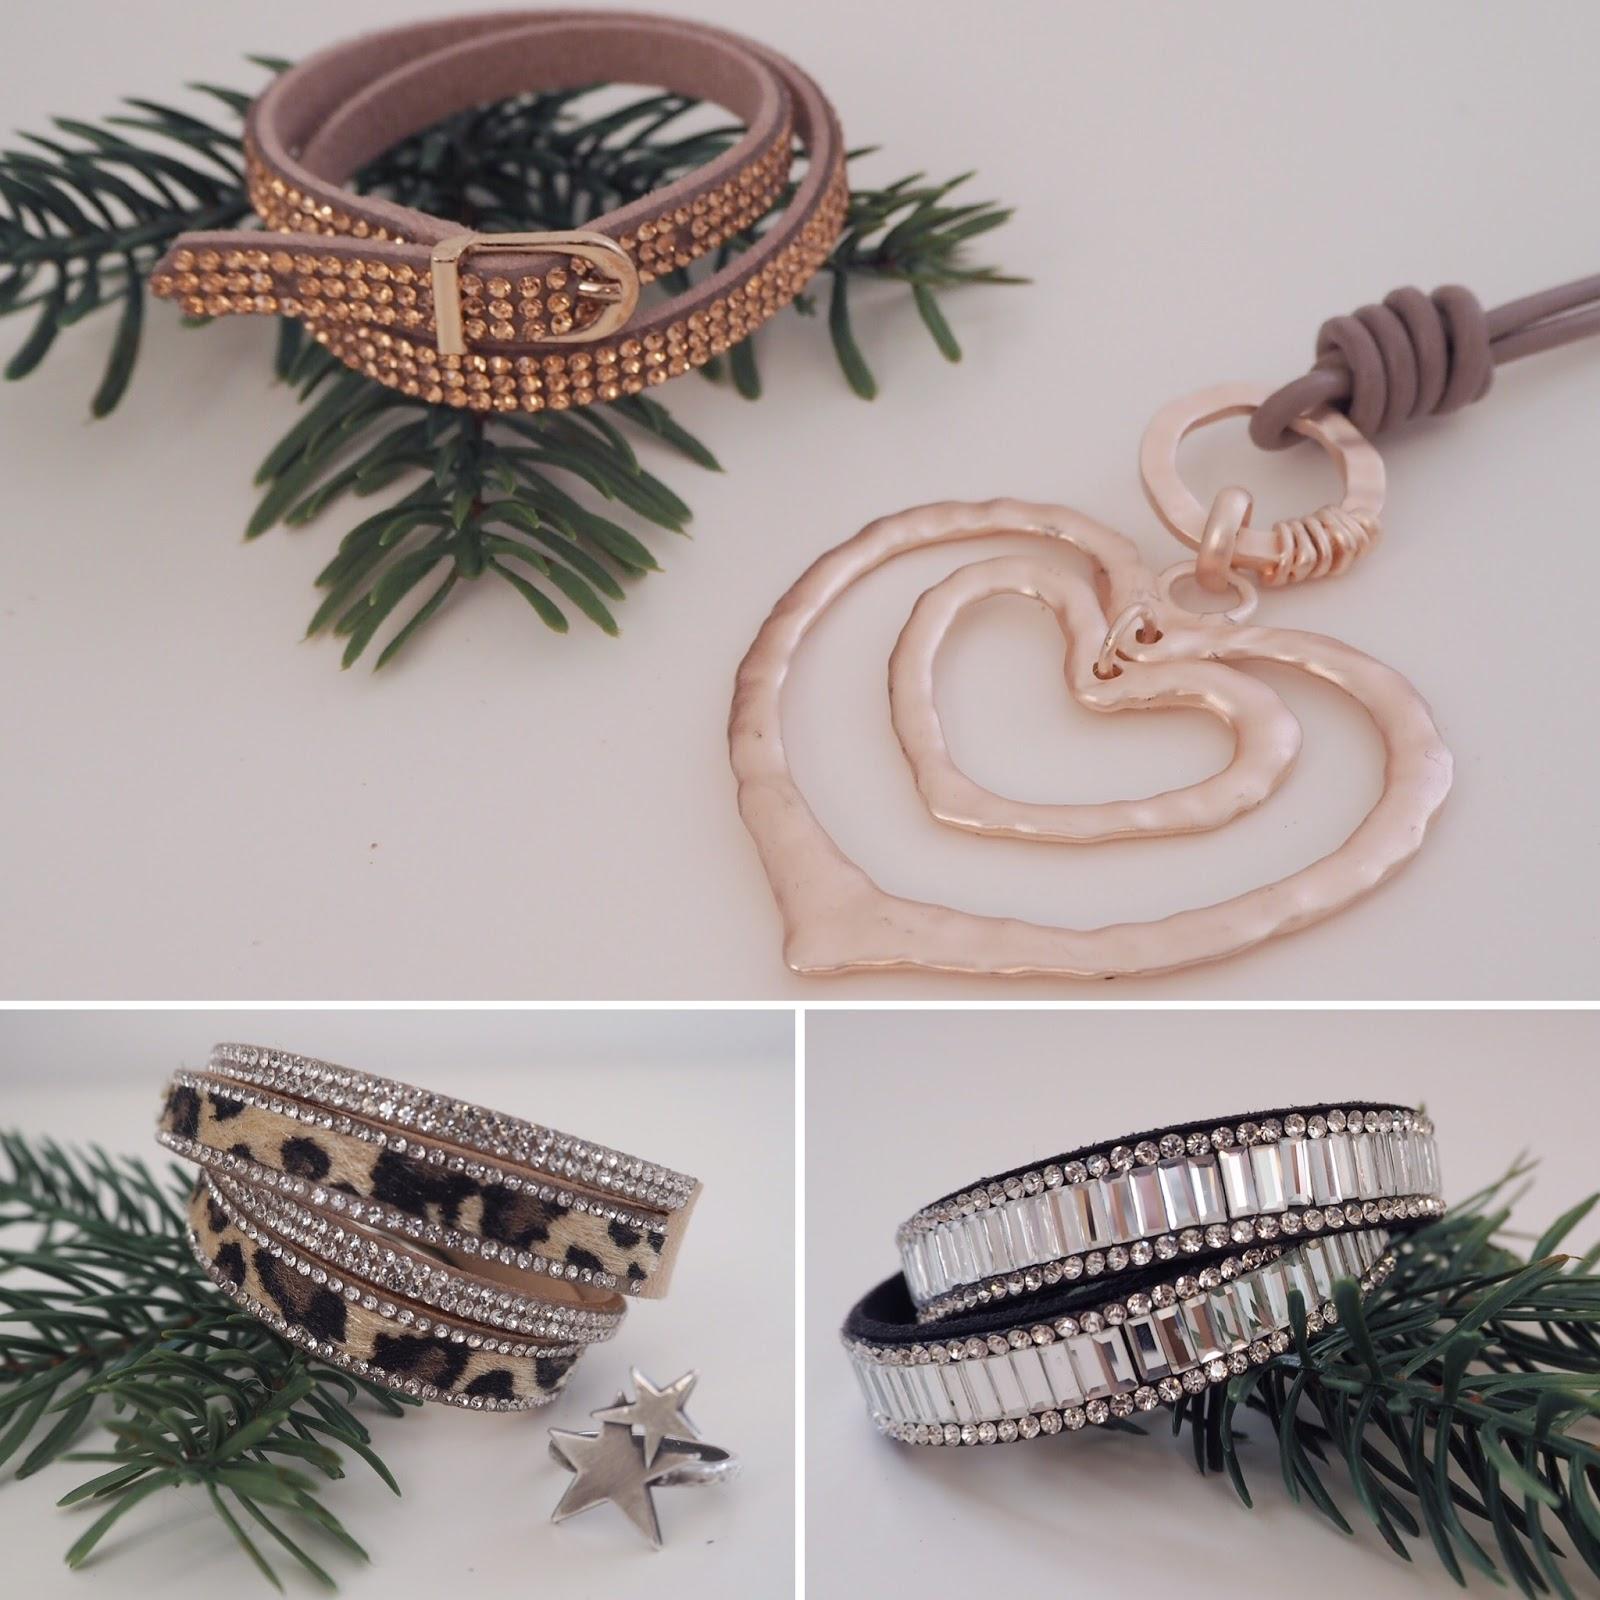 Lizzy O sparkly inexpensive wrap bracelets